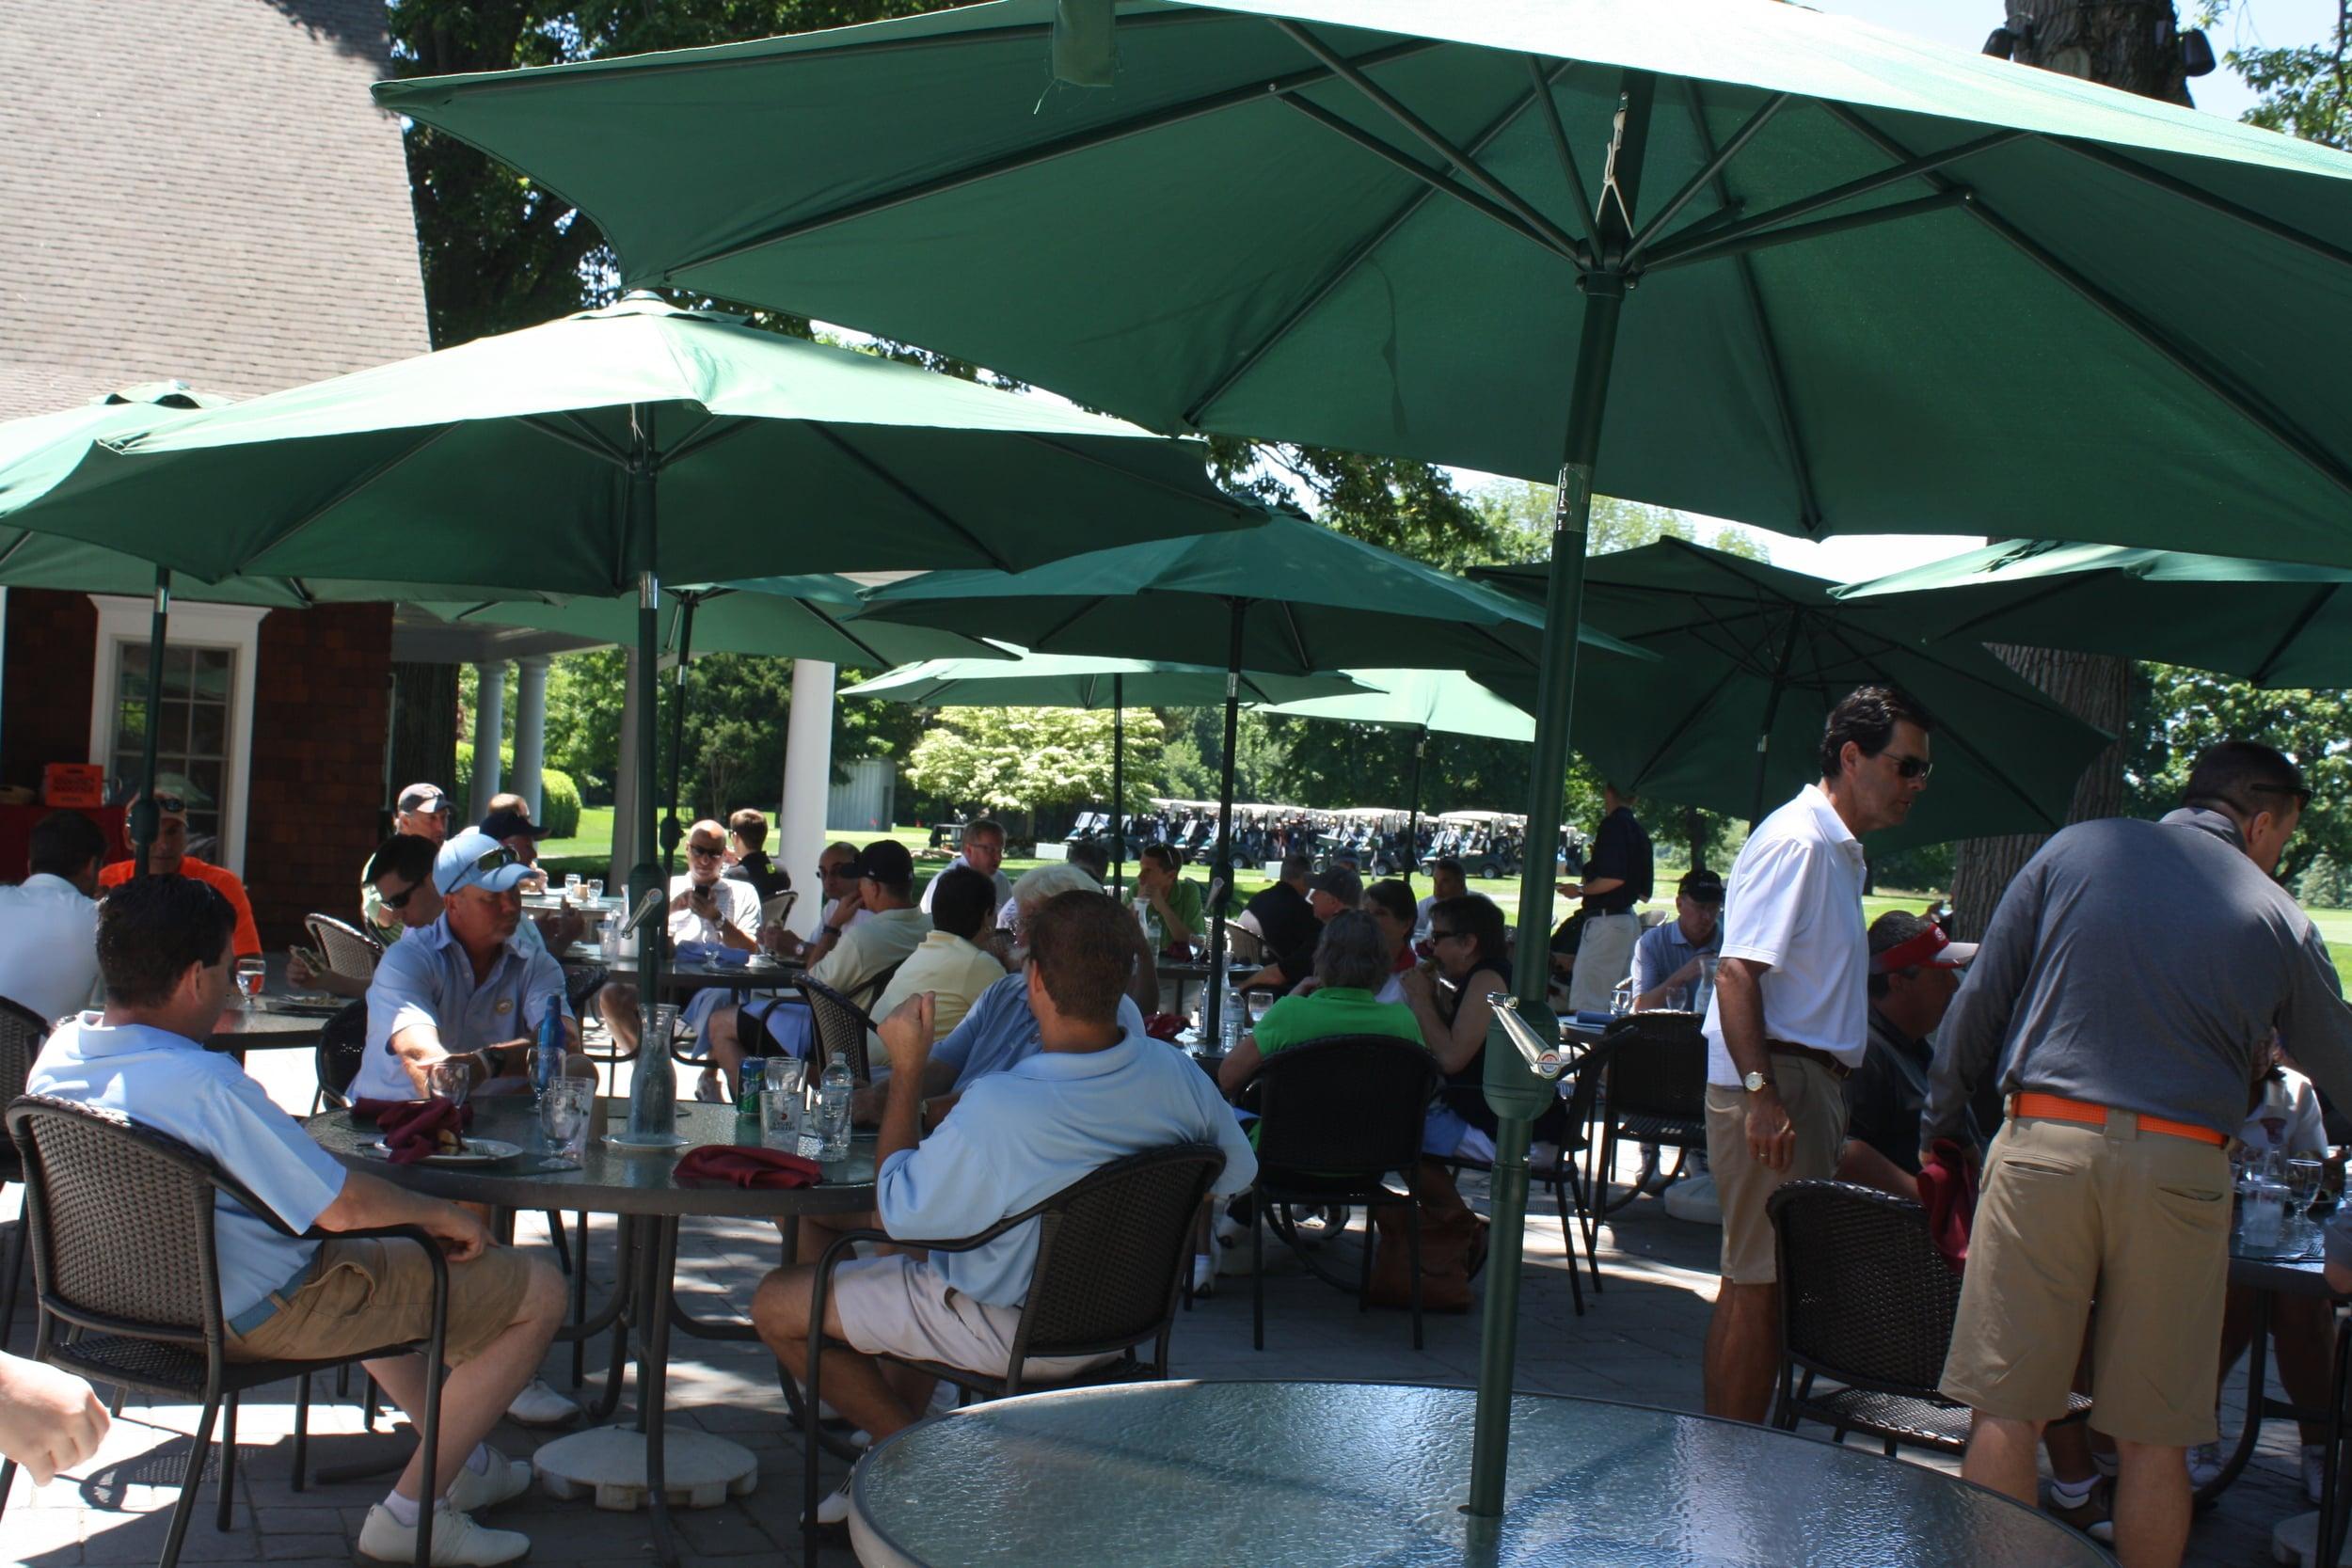 061614 rrcc golf lunch (1).JPG